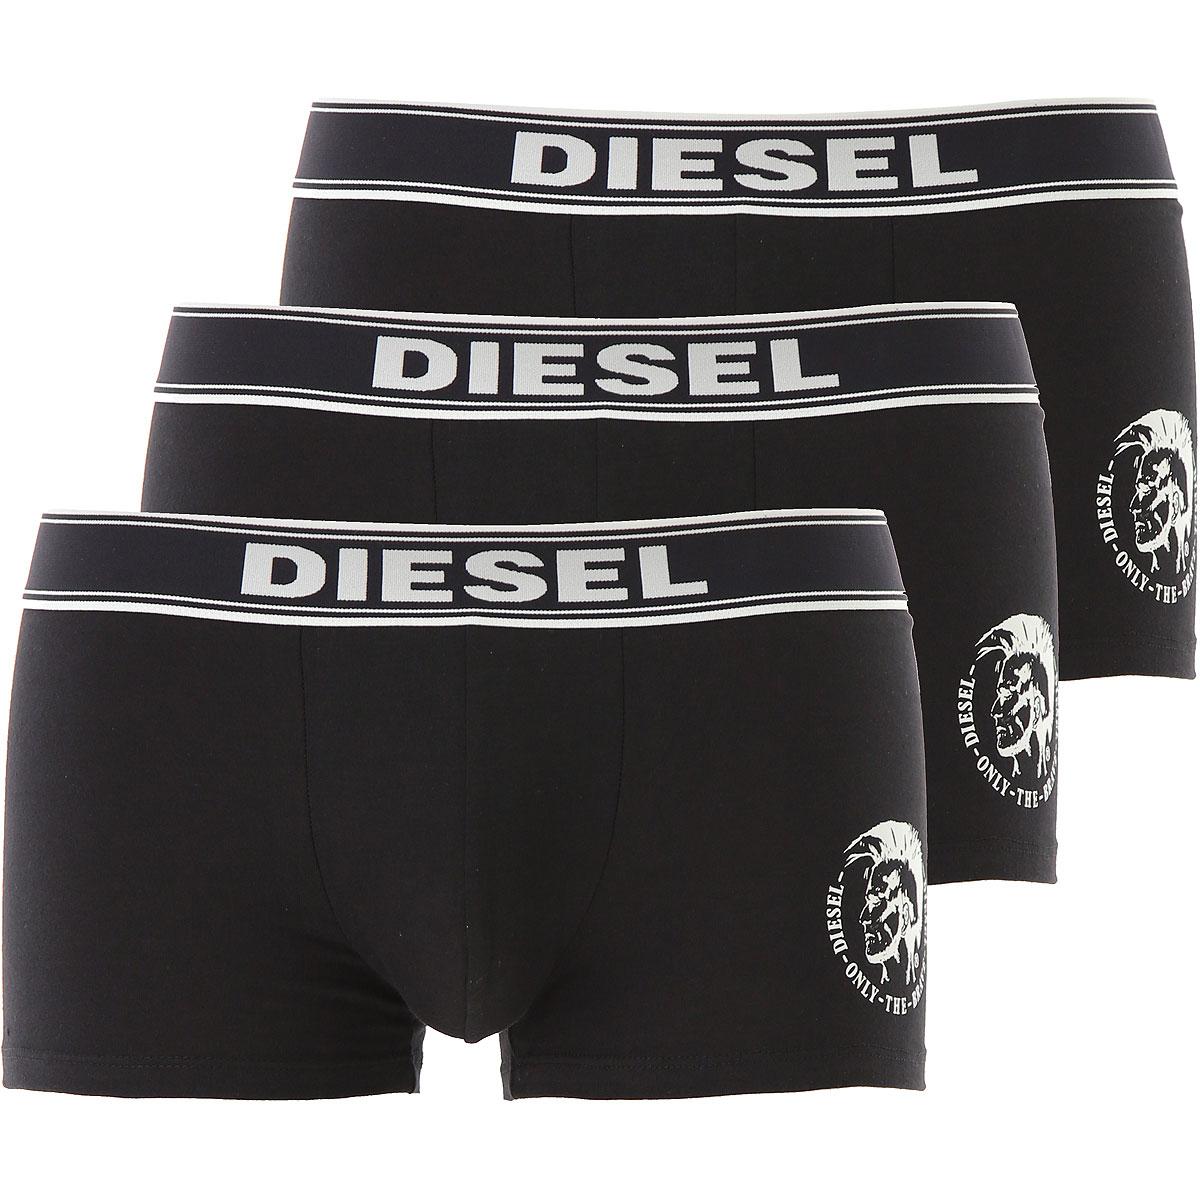 Image of Diesel Boxer Briefs for Men, Boxers, 3 Pack, Black, Cotton, 2017, M (EU 4) S (EU 3) L (EU 5) XL (EU 6) XXL (EU 7)